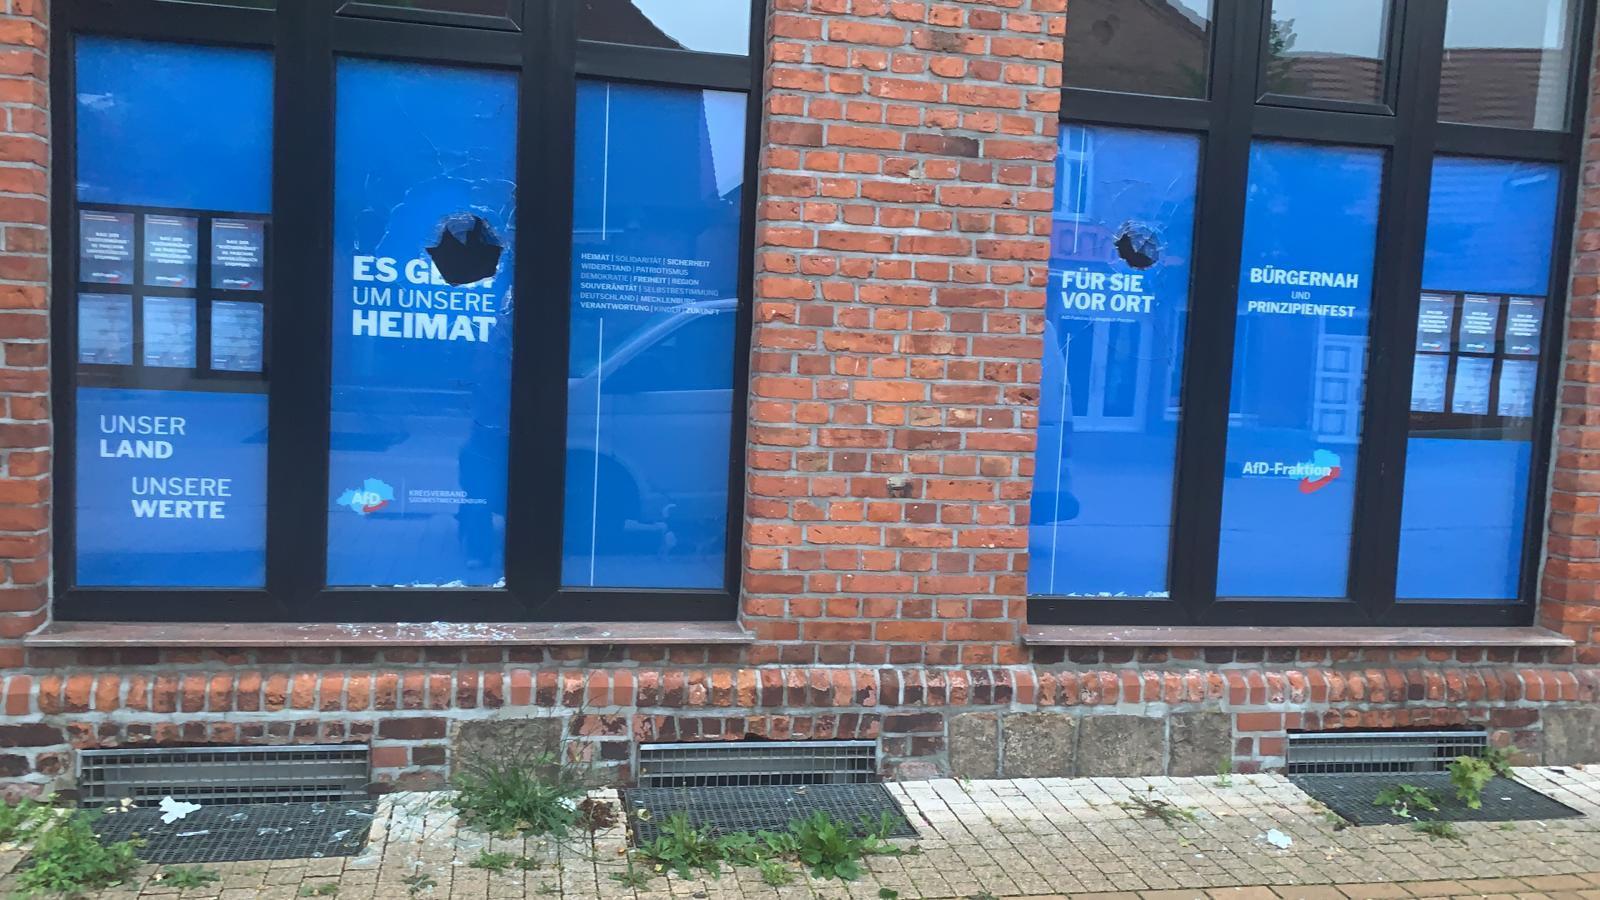 Angriff auf AfD-Parteibüro in Ludwiglust